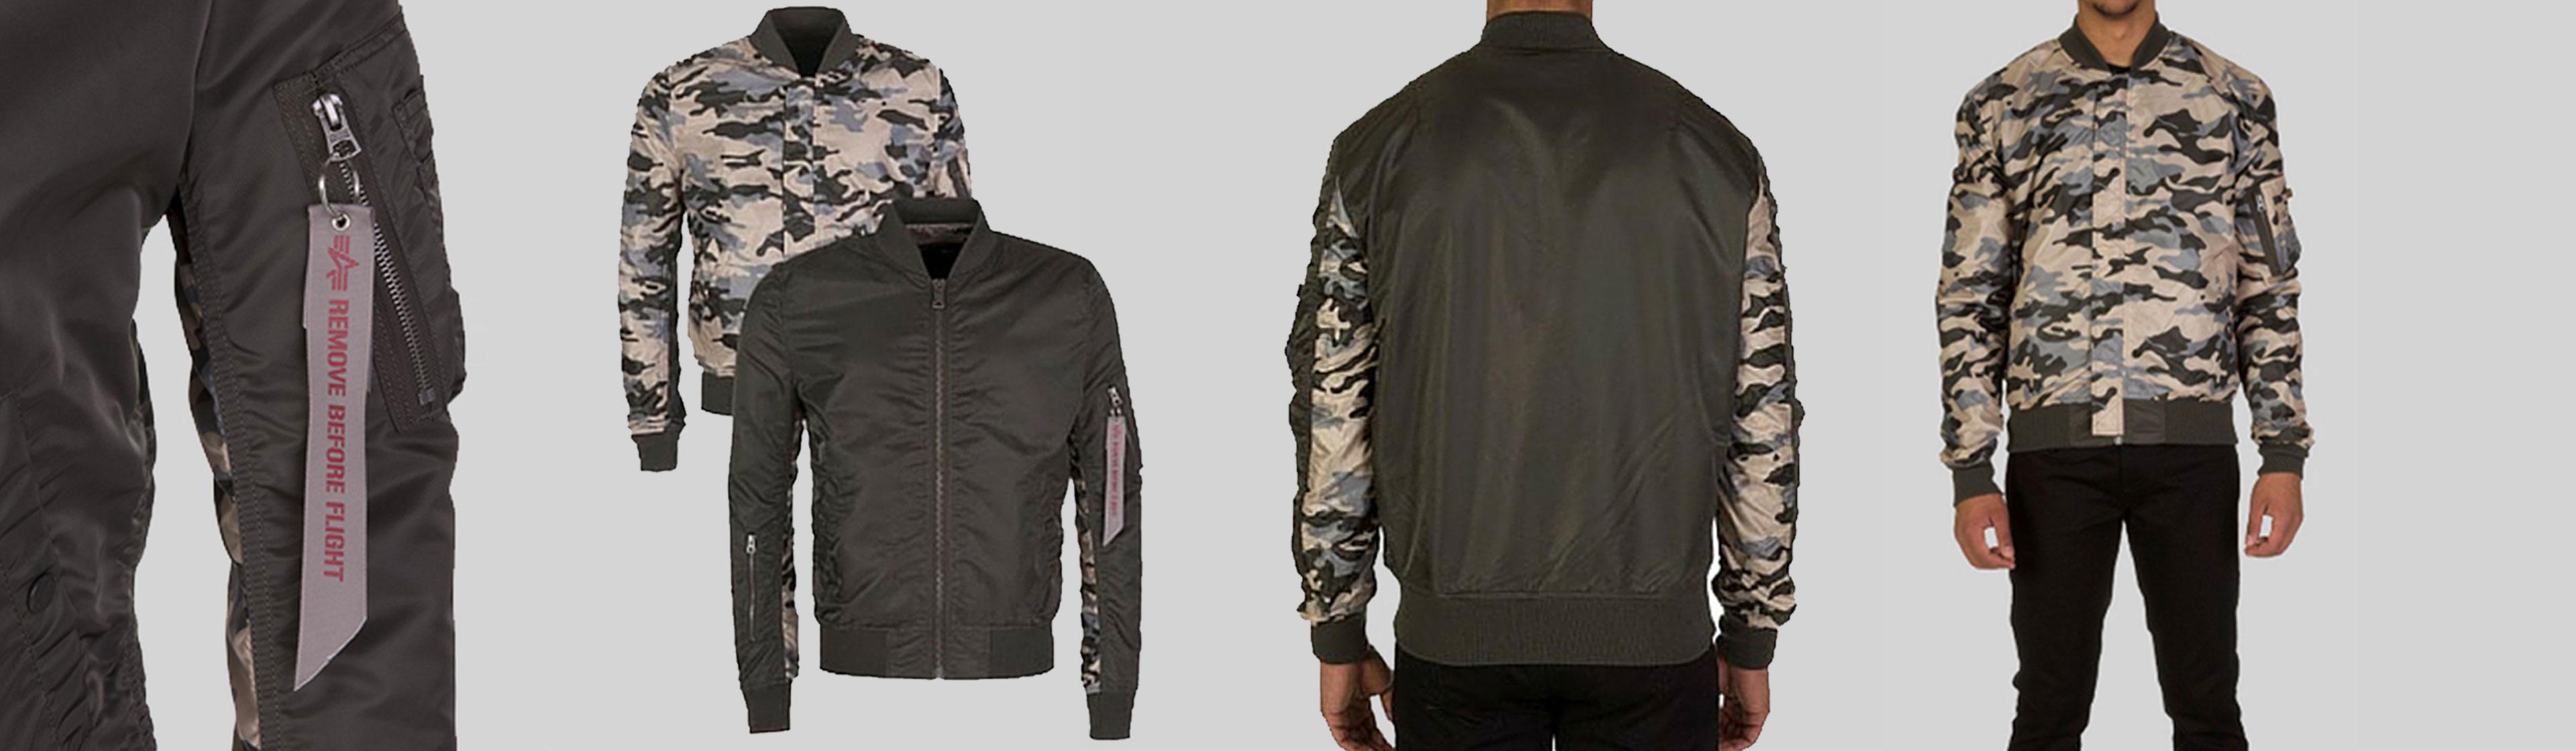 Staff Pick: Alpha Industries Green Reversible Bomber Jacket